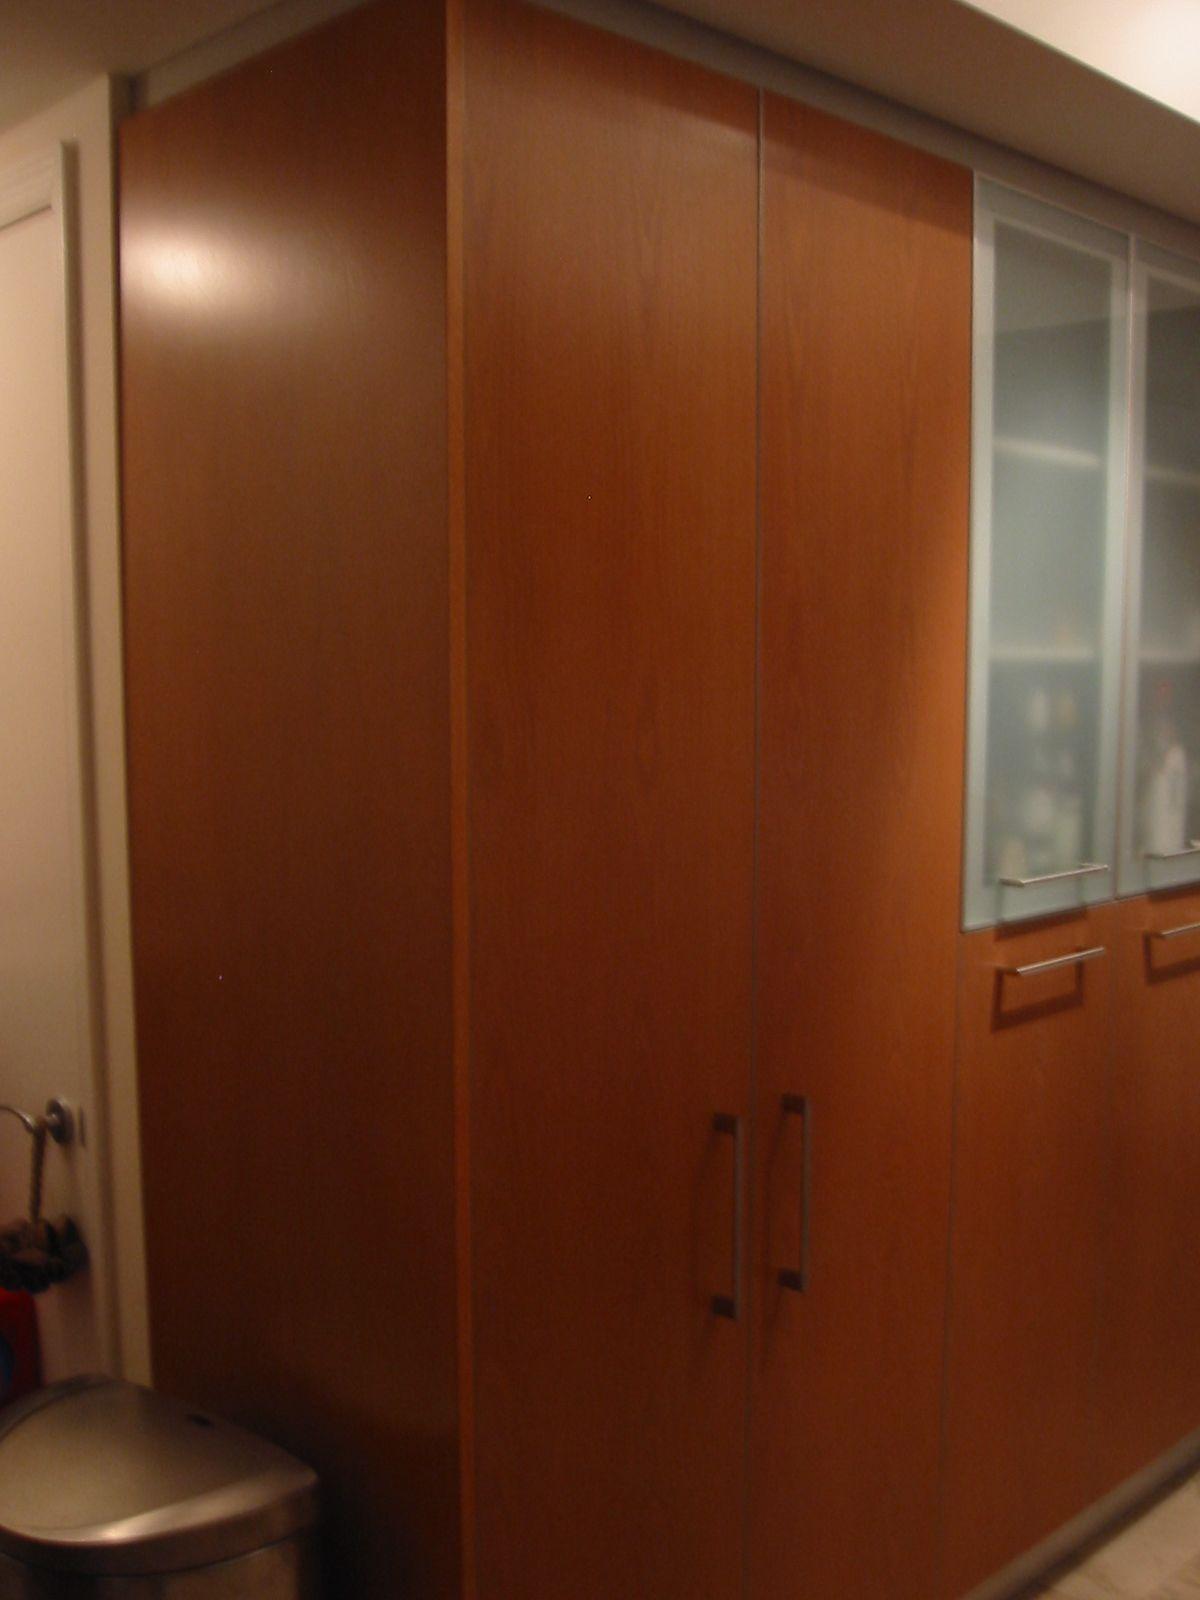 Kitchens-177.jpg